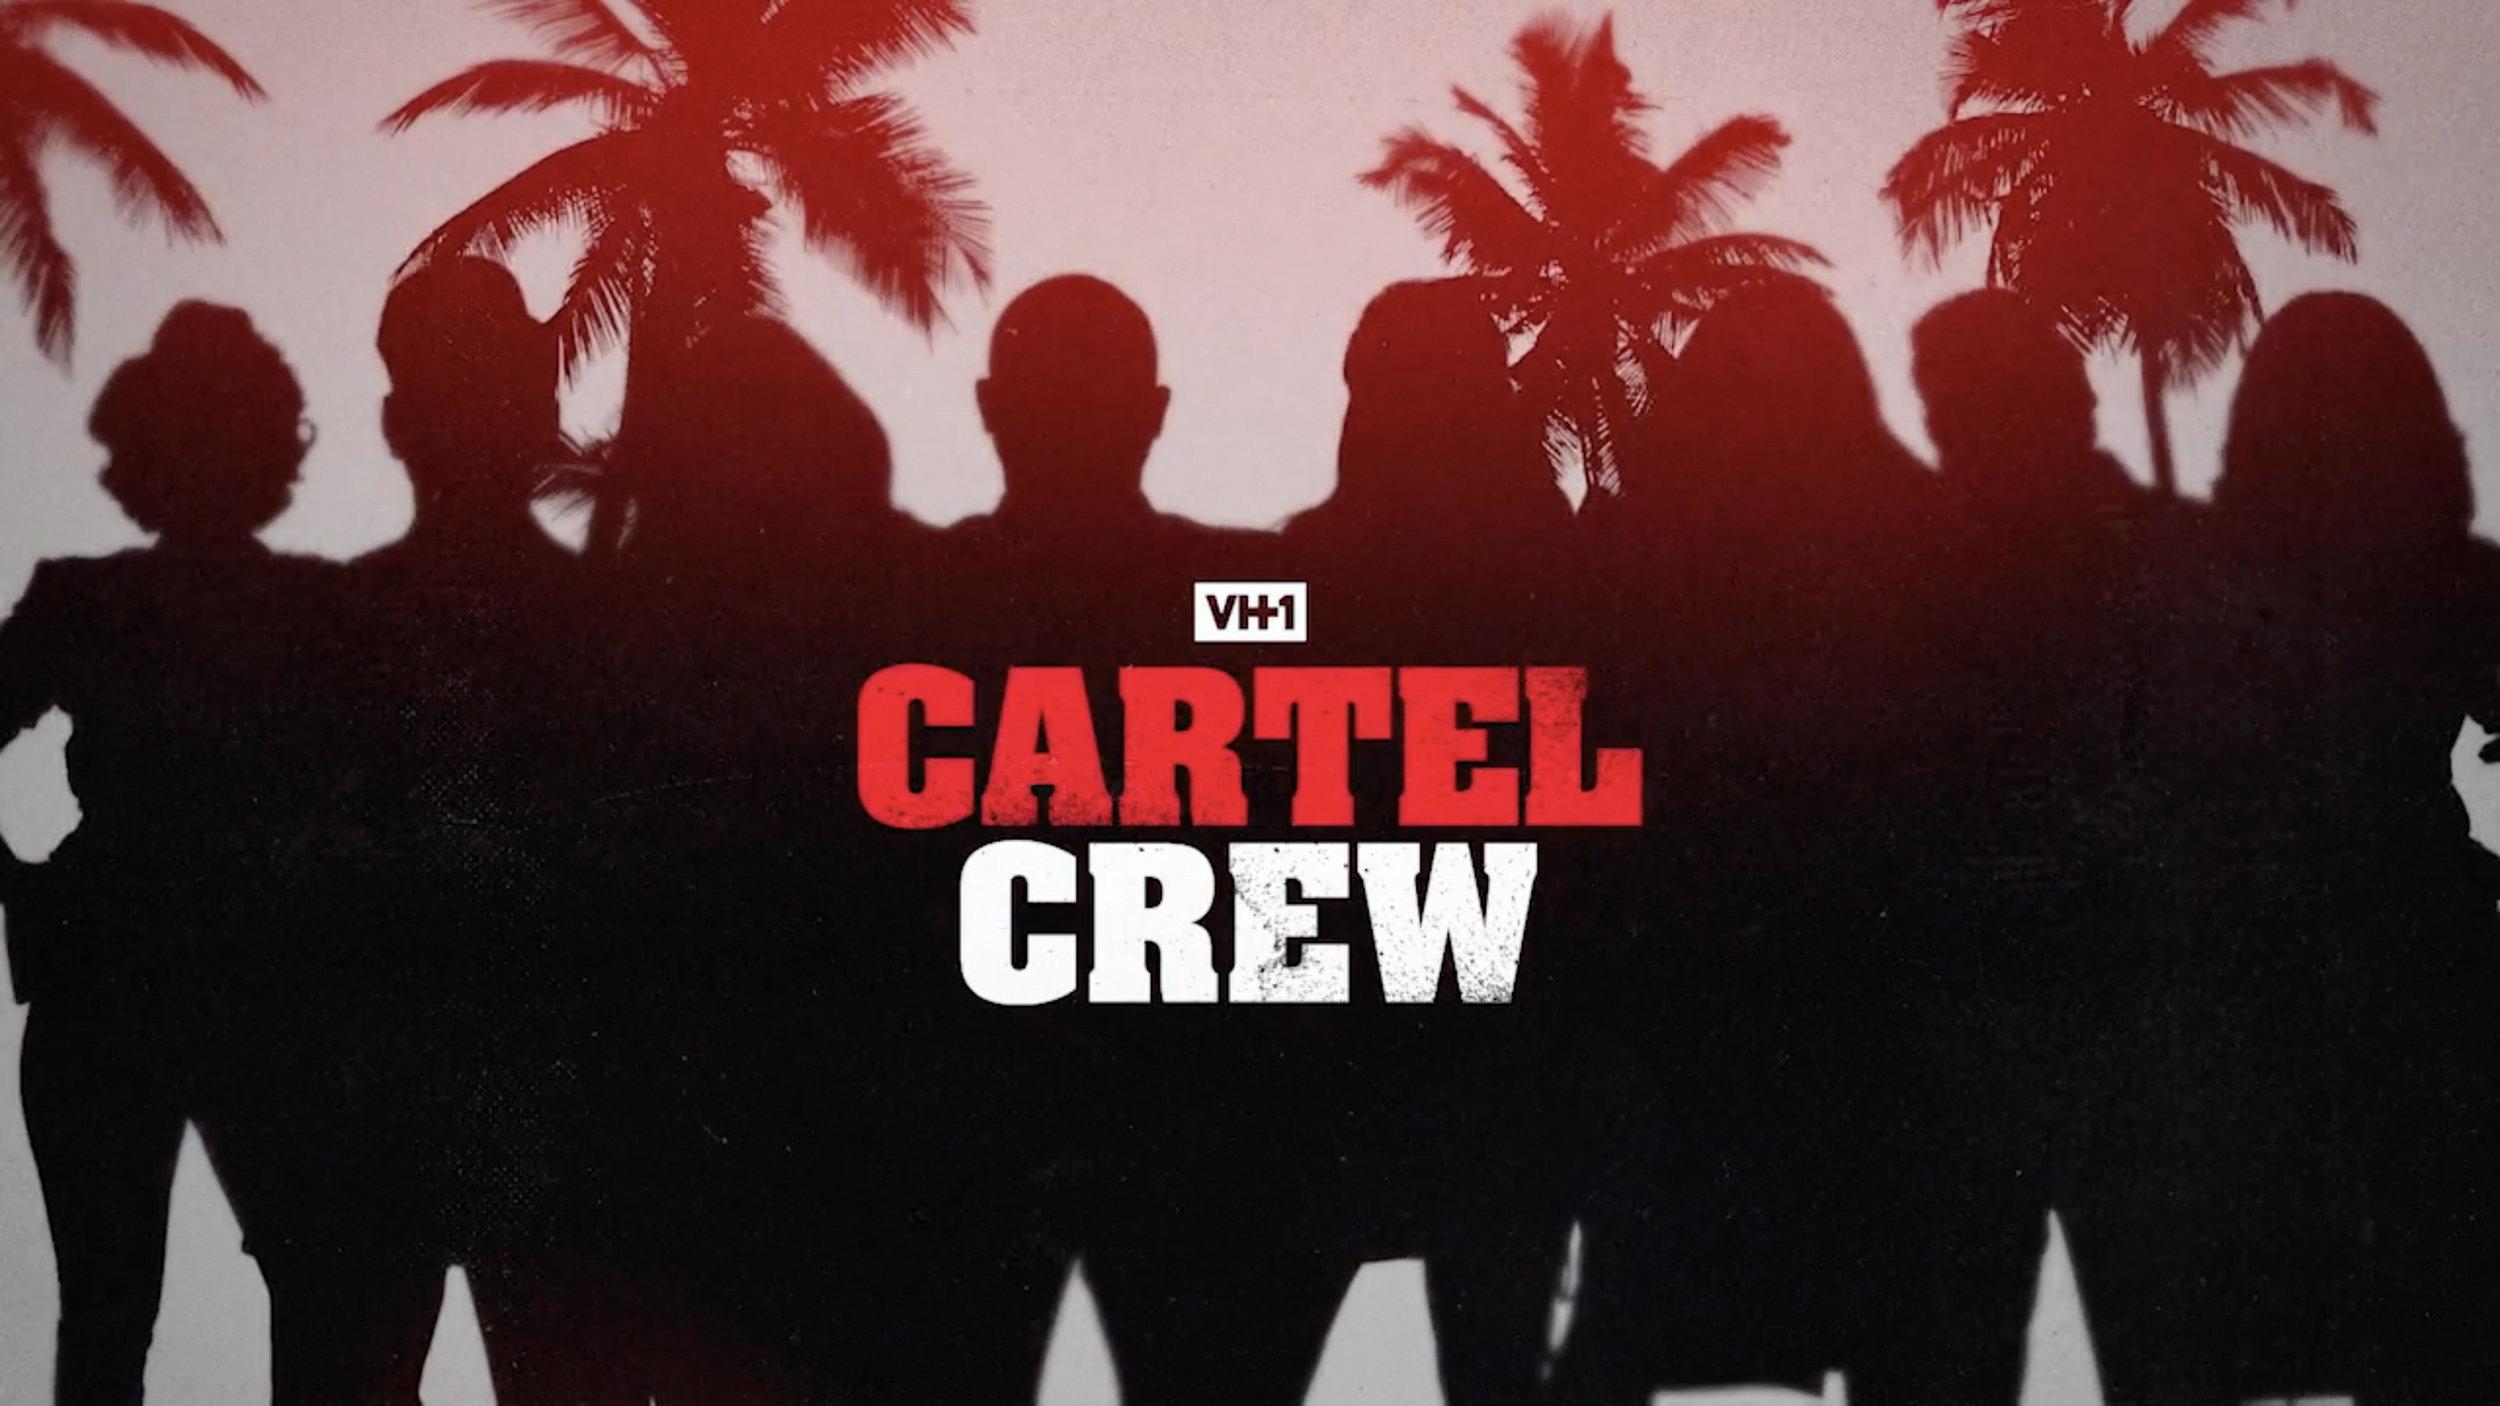 VH1 | CARTEL CREW